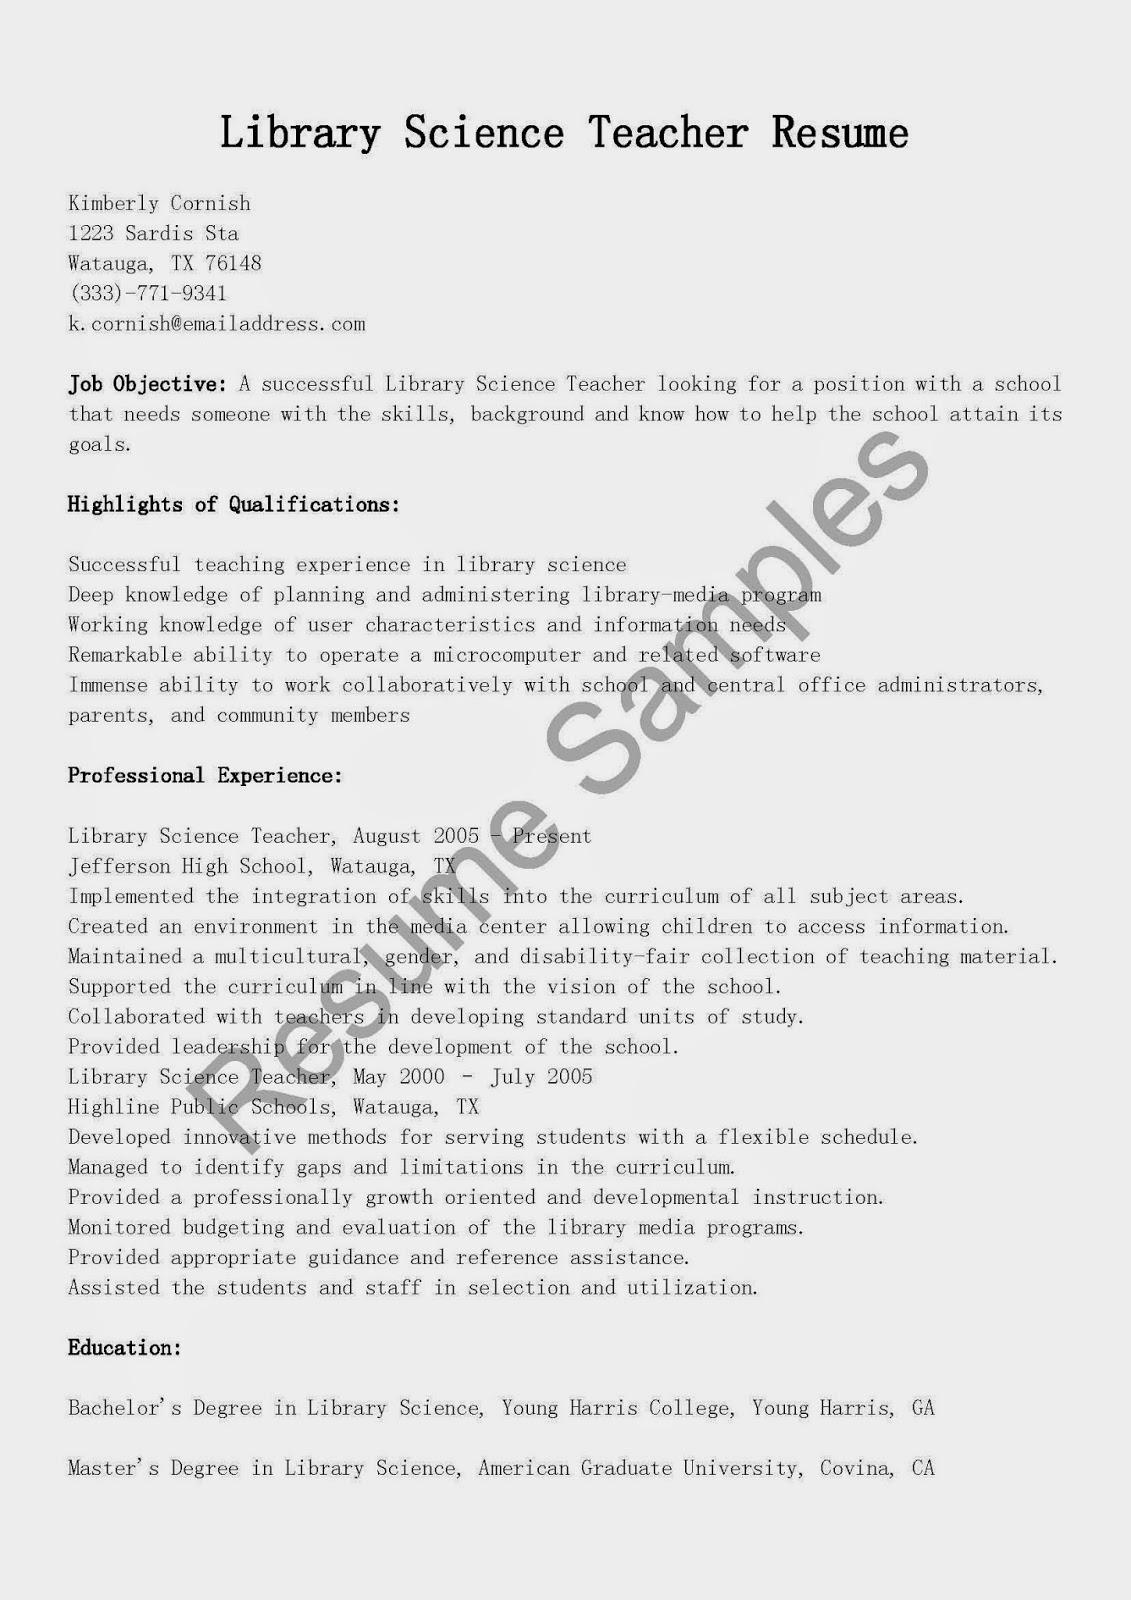 resume samples library science teacher resume sample